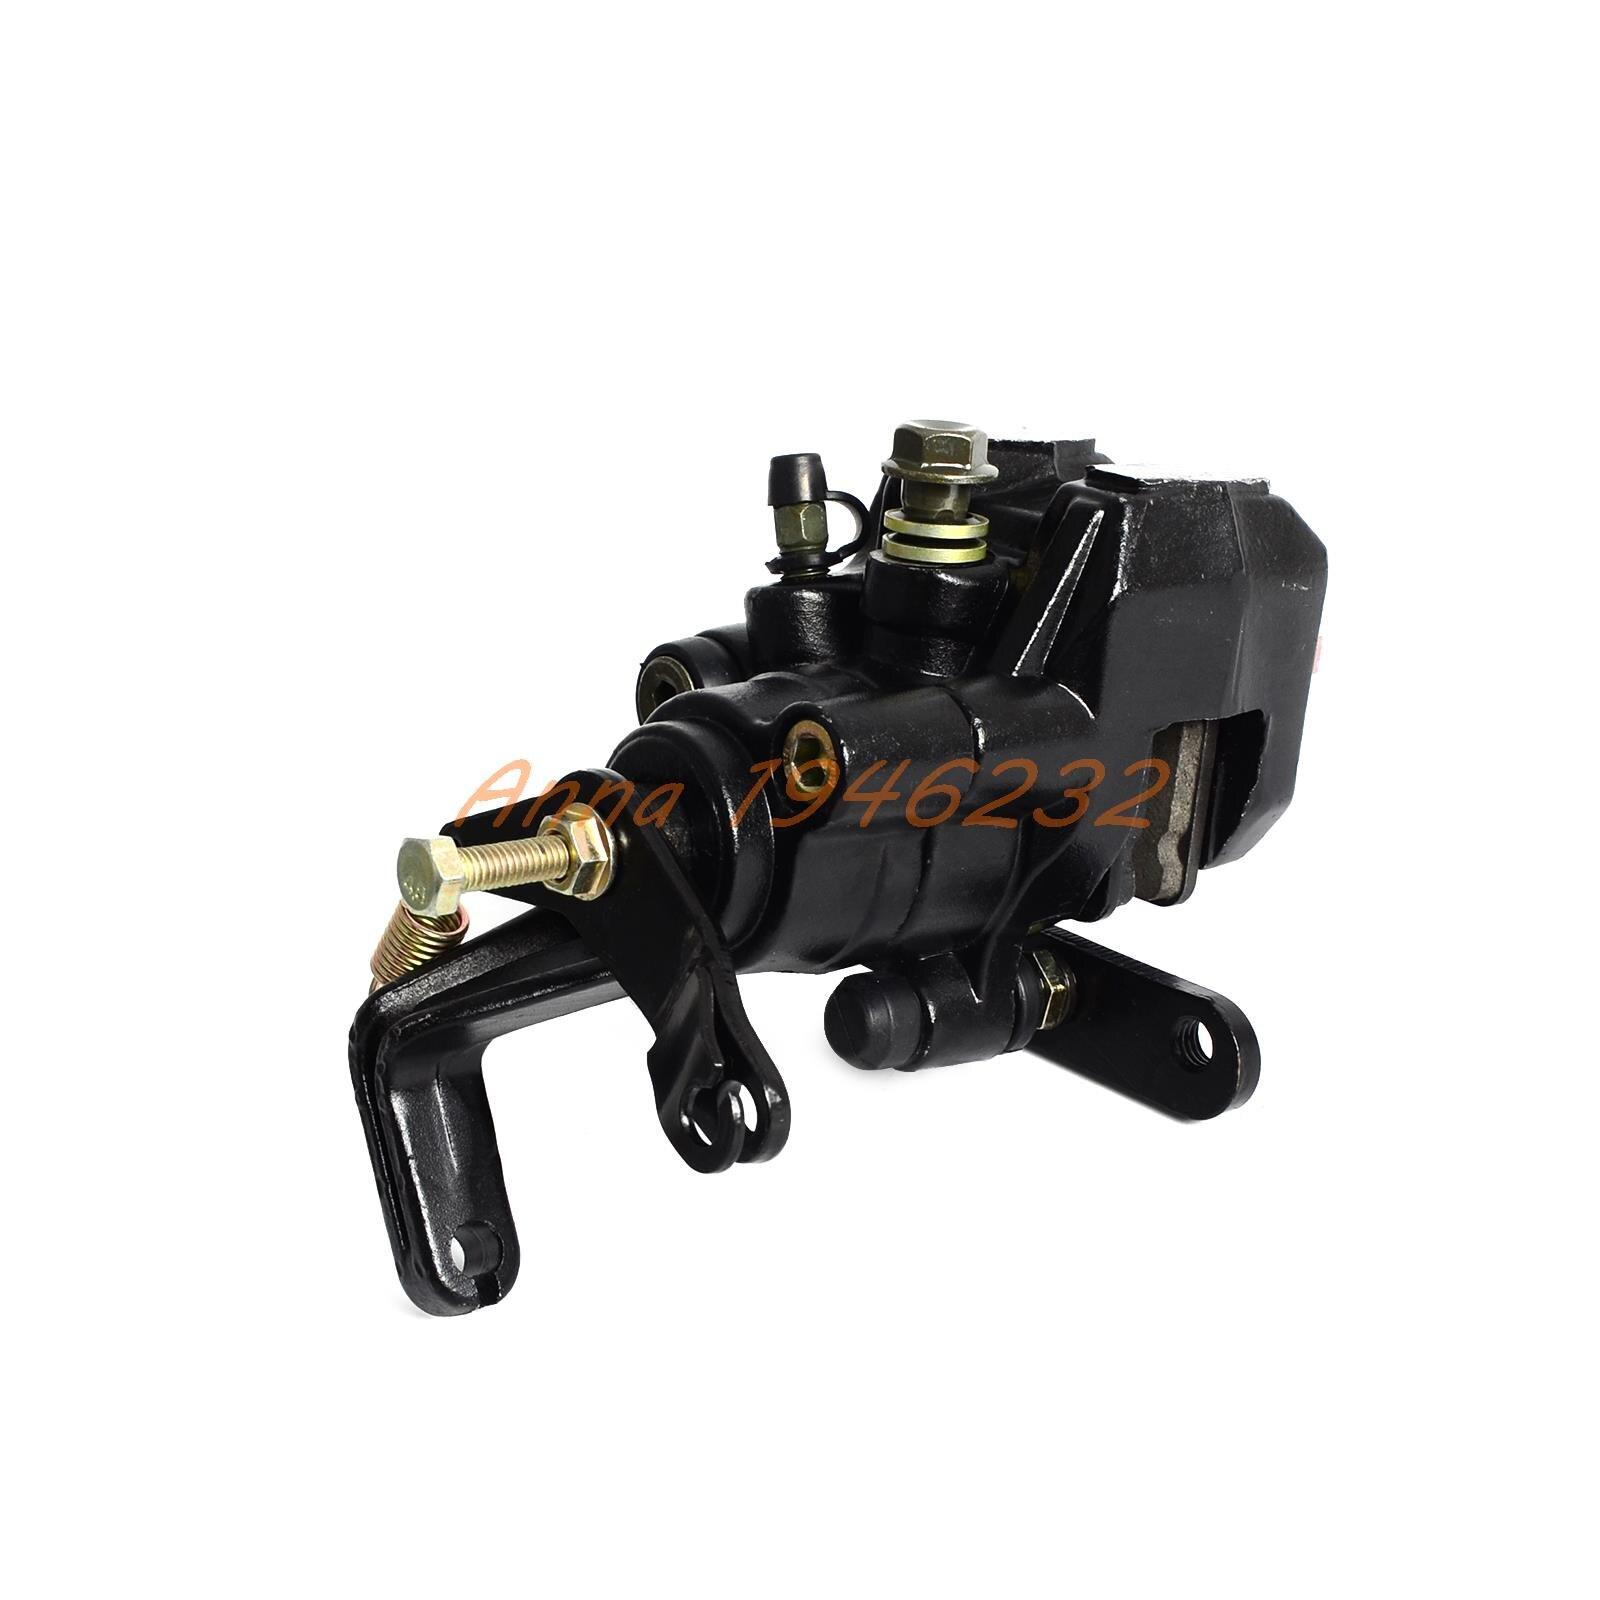 FOR YAMAHA ATV 1995-2005 WOLVERINE YFM350 Rear brake caliper Assembly 1UY-2580W-00-00<br><br>Aliexpress